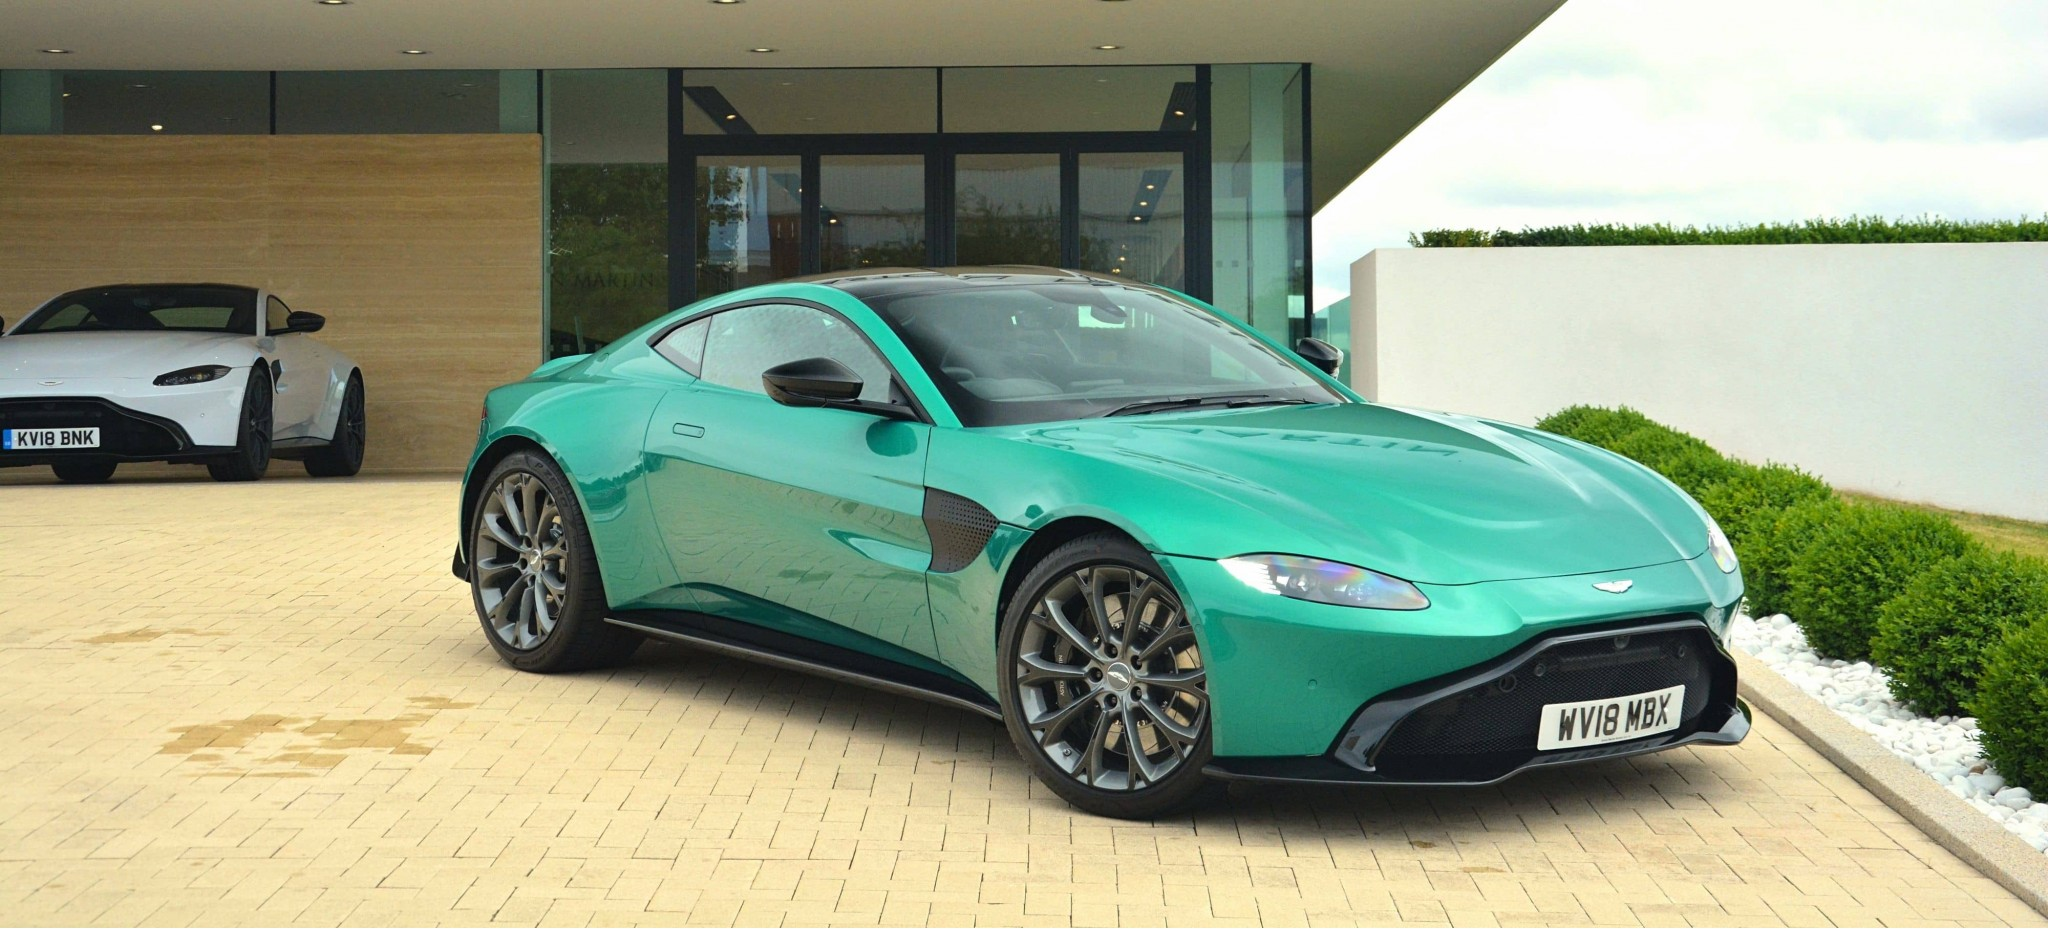 New Aston Martin >> Aston Martin Bristol Has The Aston Martin Vantage 4 0 V8